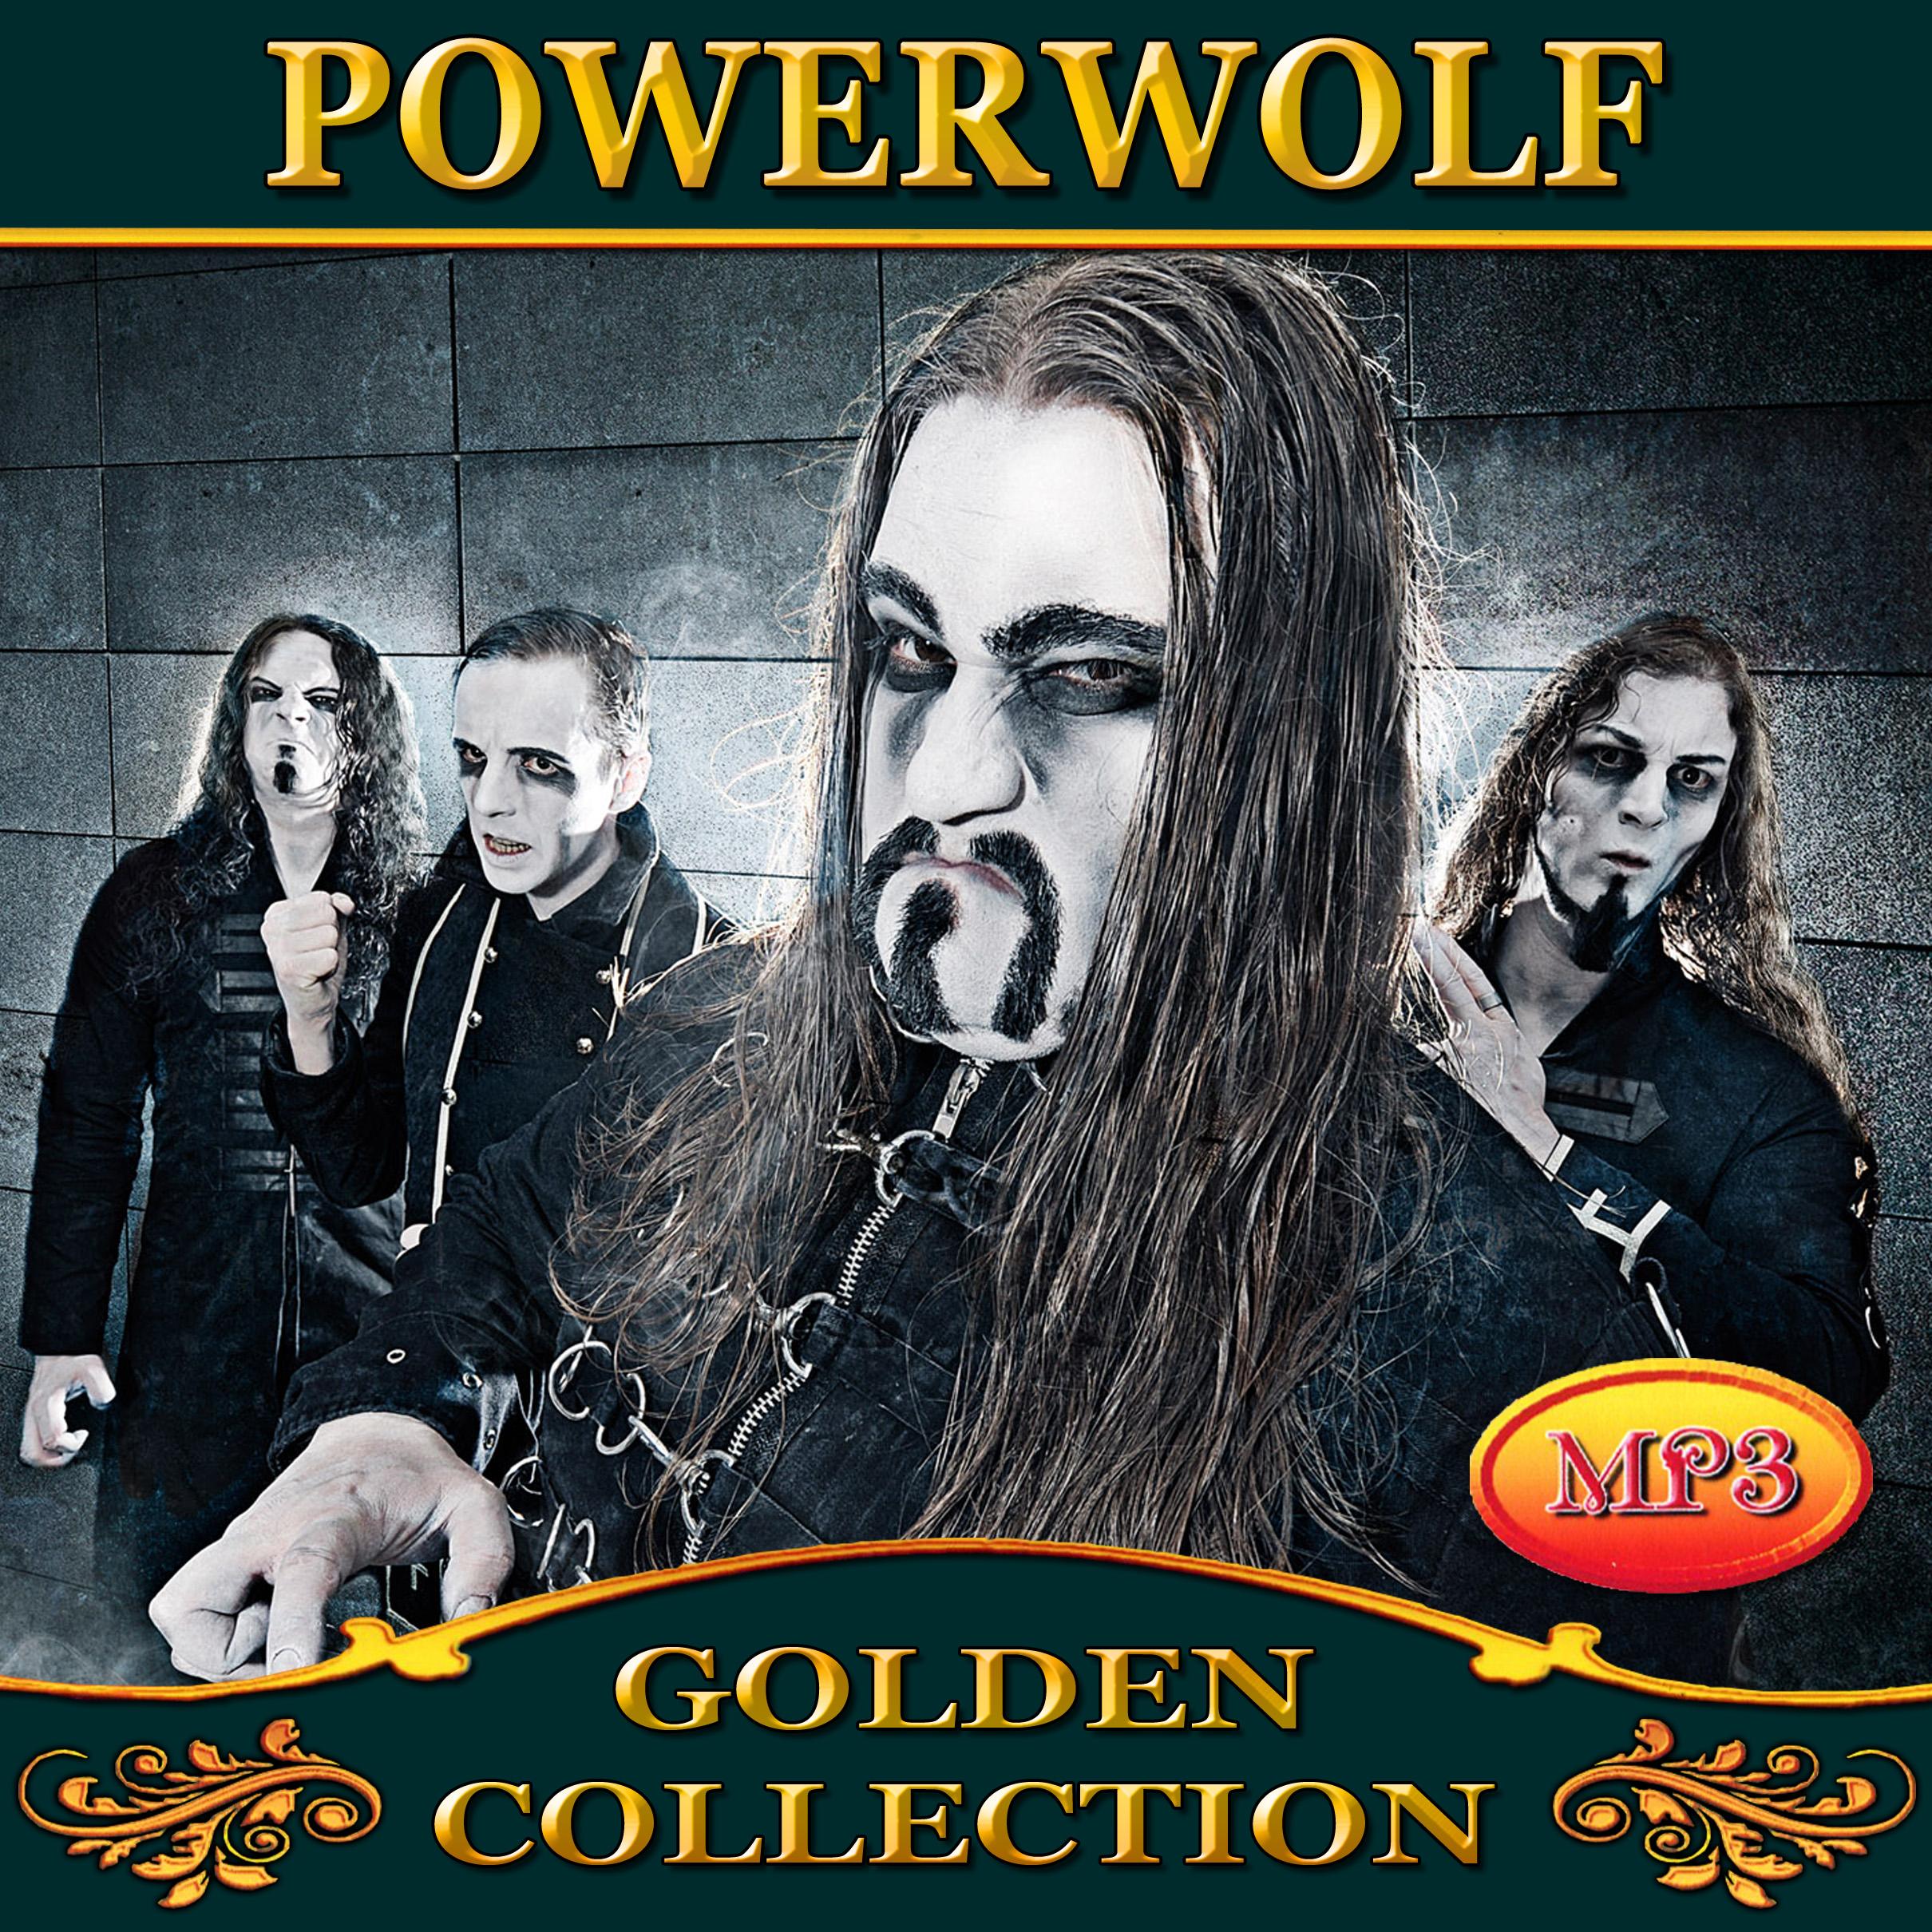 Powerwolf [mp3]